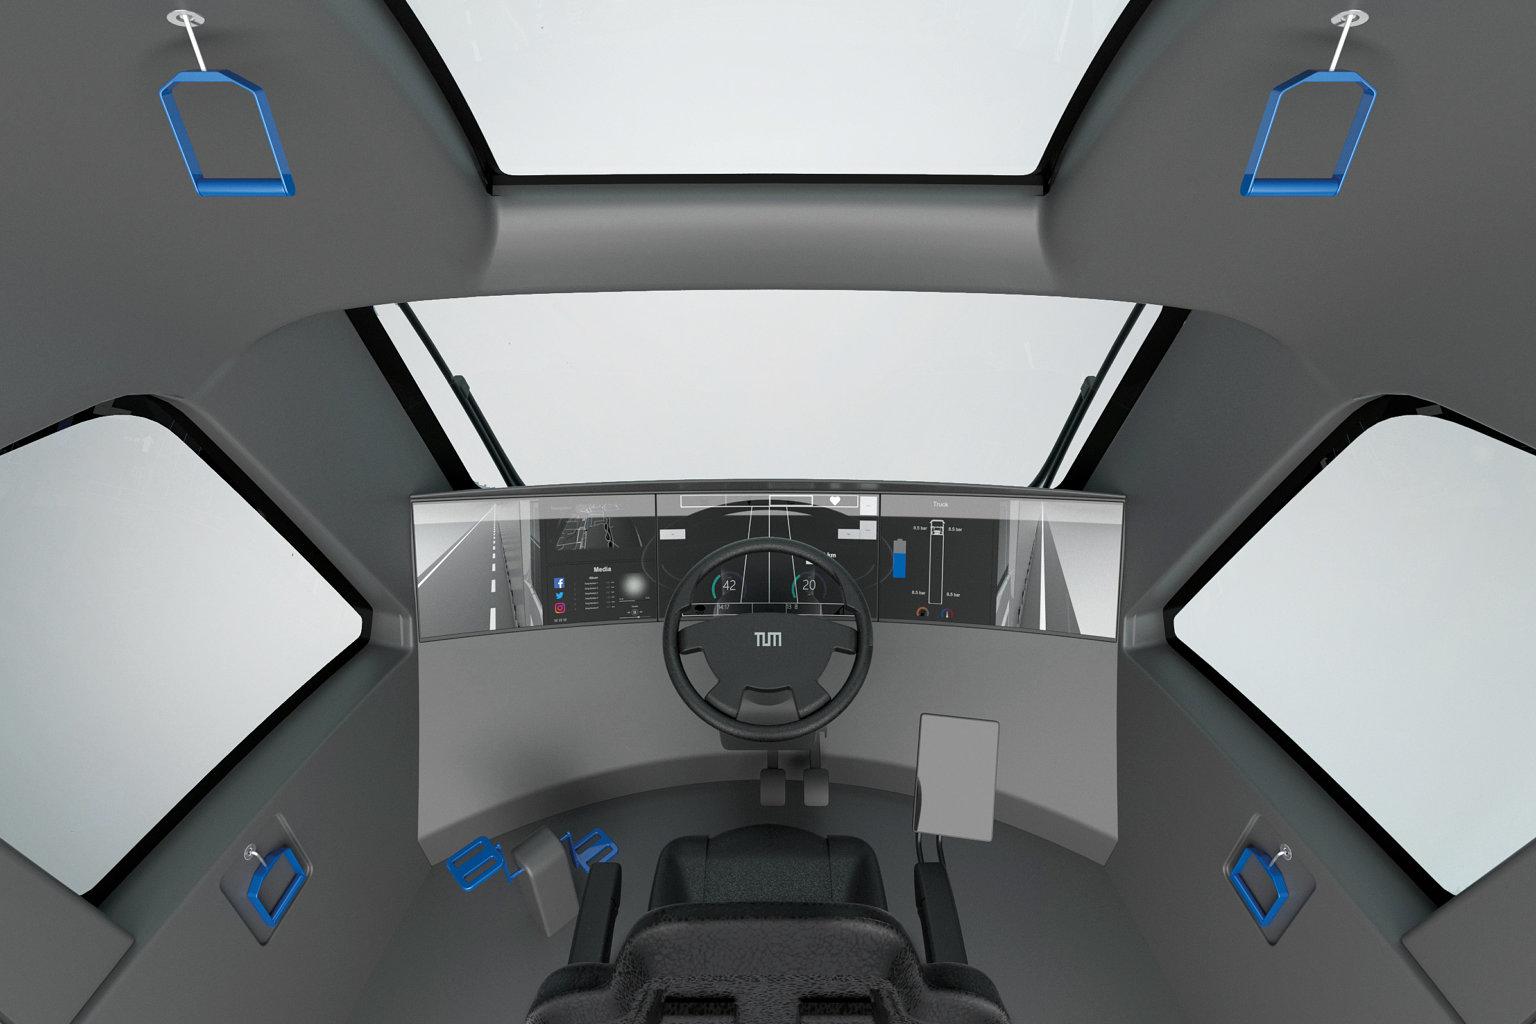 Truck 2030 interior